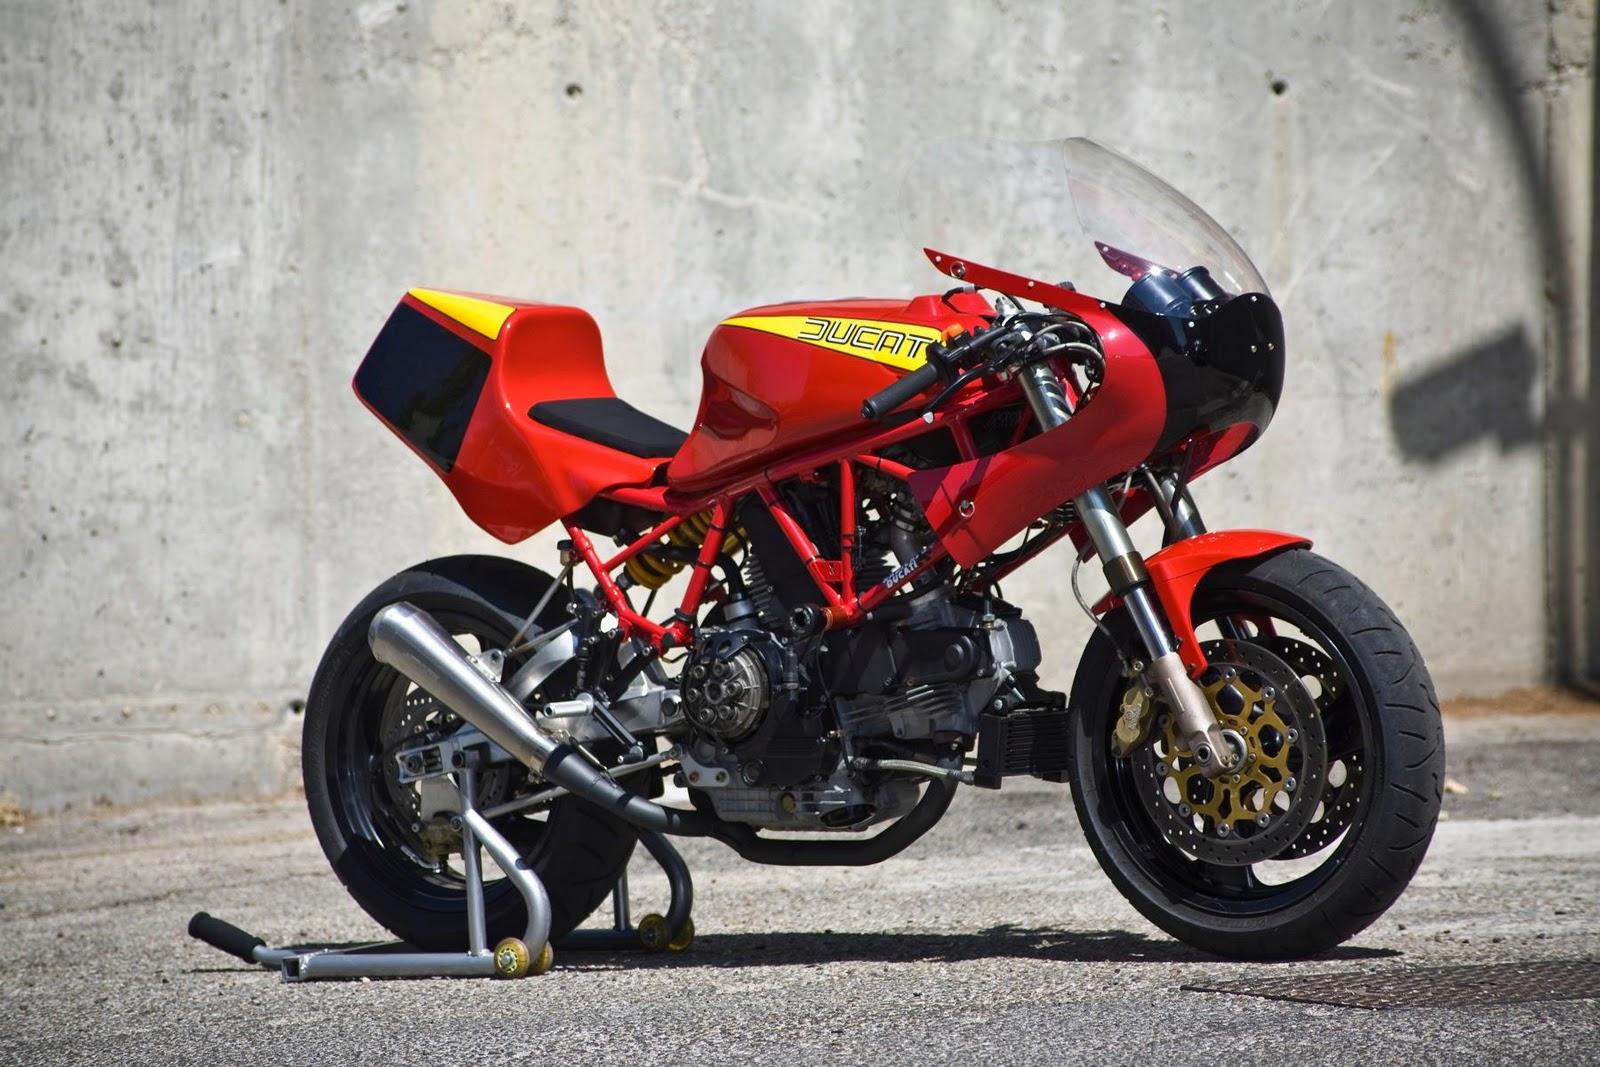 1981 Ducati 900 SS - Moto.ZombDrive.COM